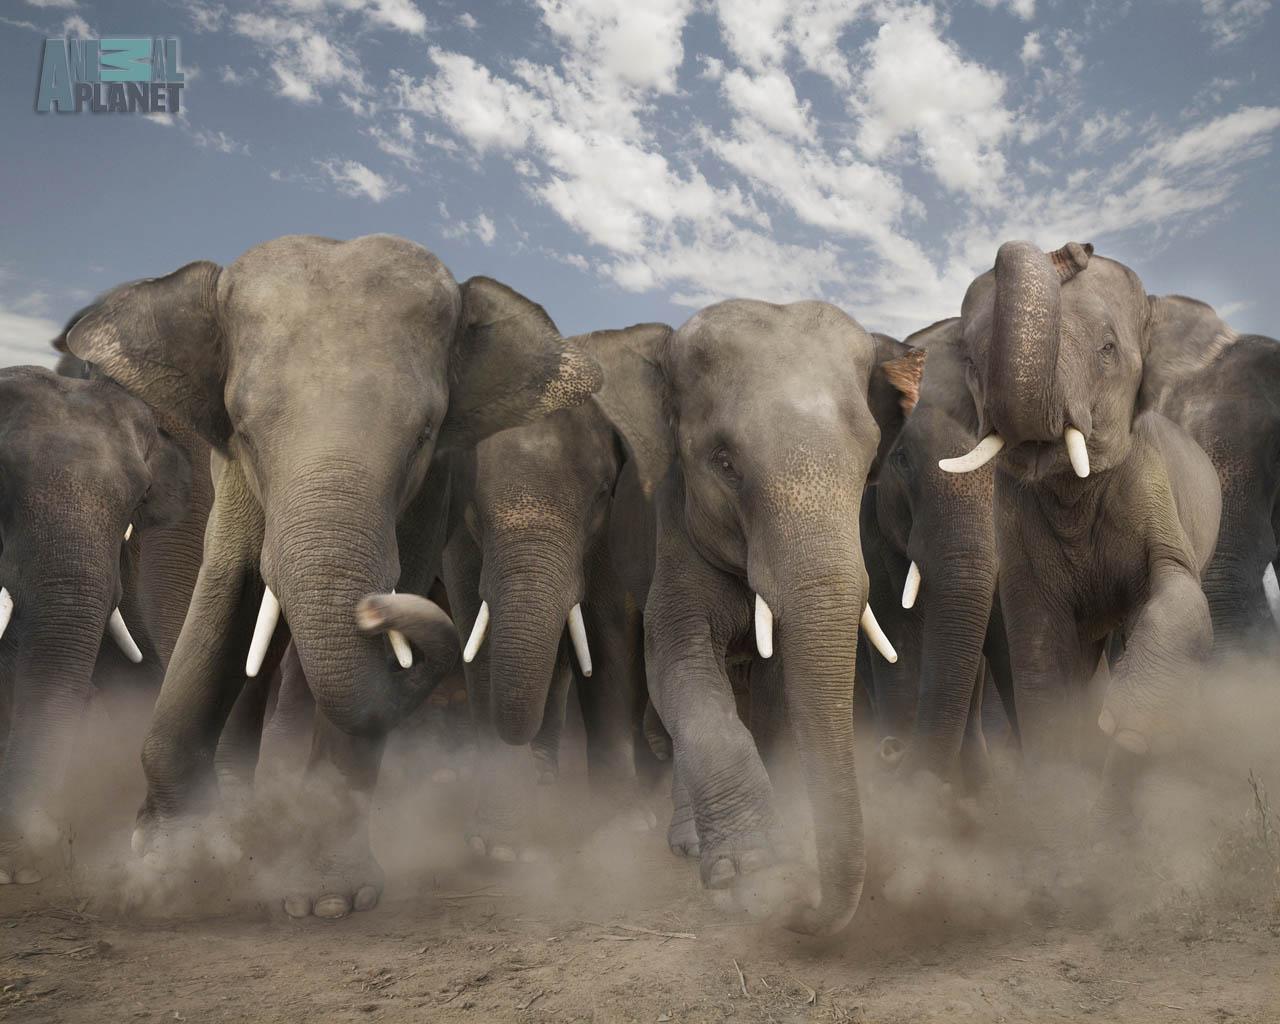 http://1.bp.blogspot.com/-AY8pxYAjstI/UAKmdhIn6EI/AAAAAAAAELY/zXZqhS-XzrA/s1600/wallpaper-elephant-lg.jpg